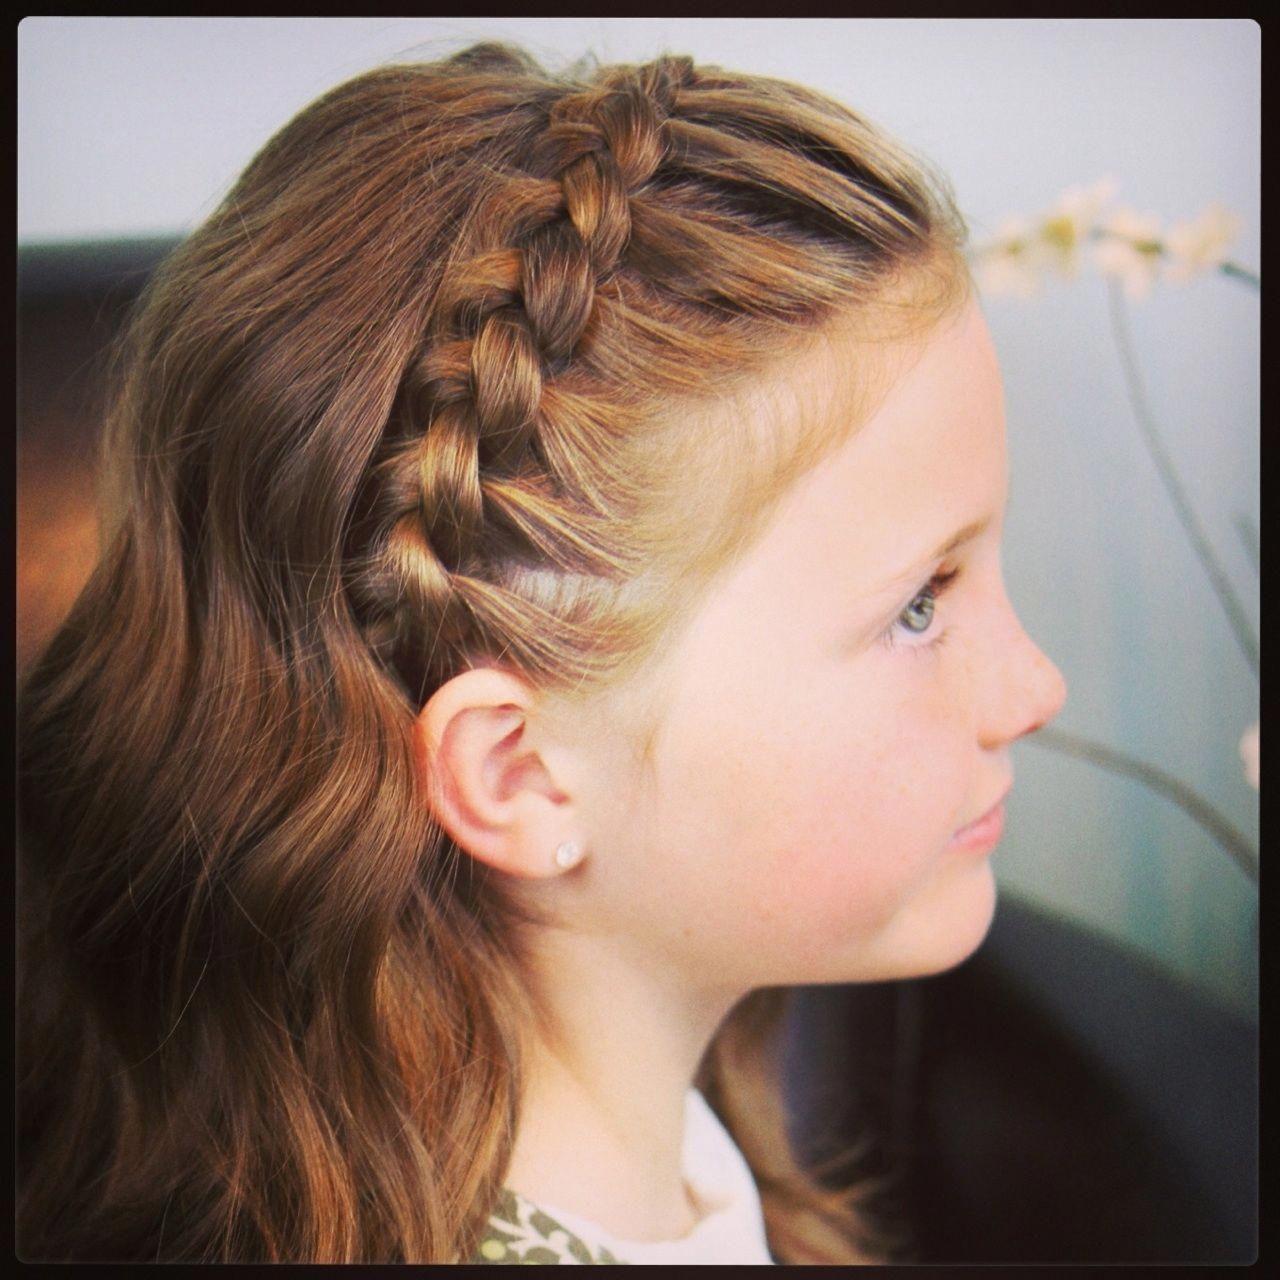 dutch lace braided headband | braid hairstyles #braid